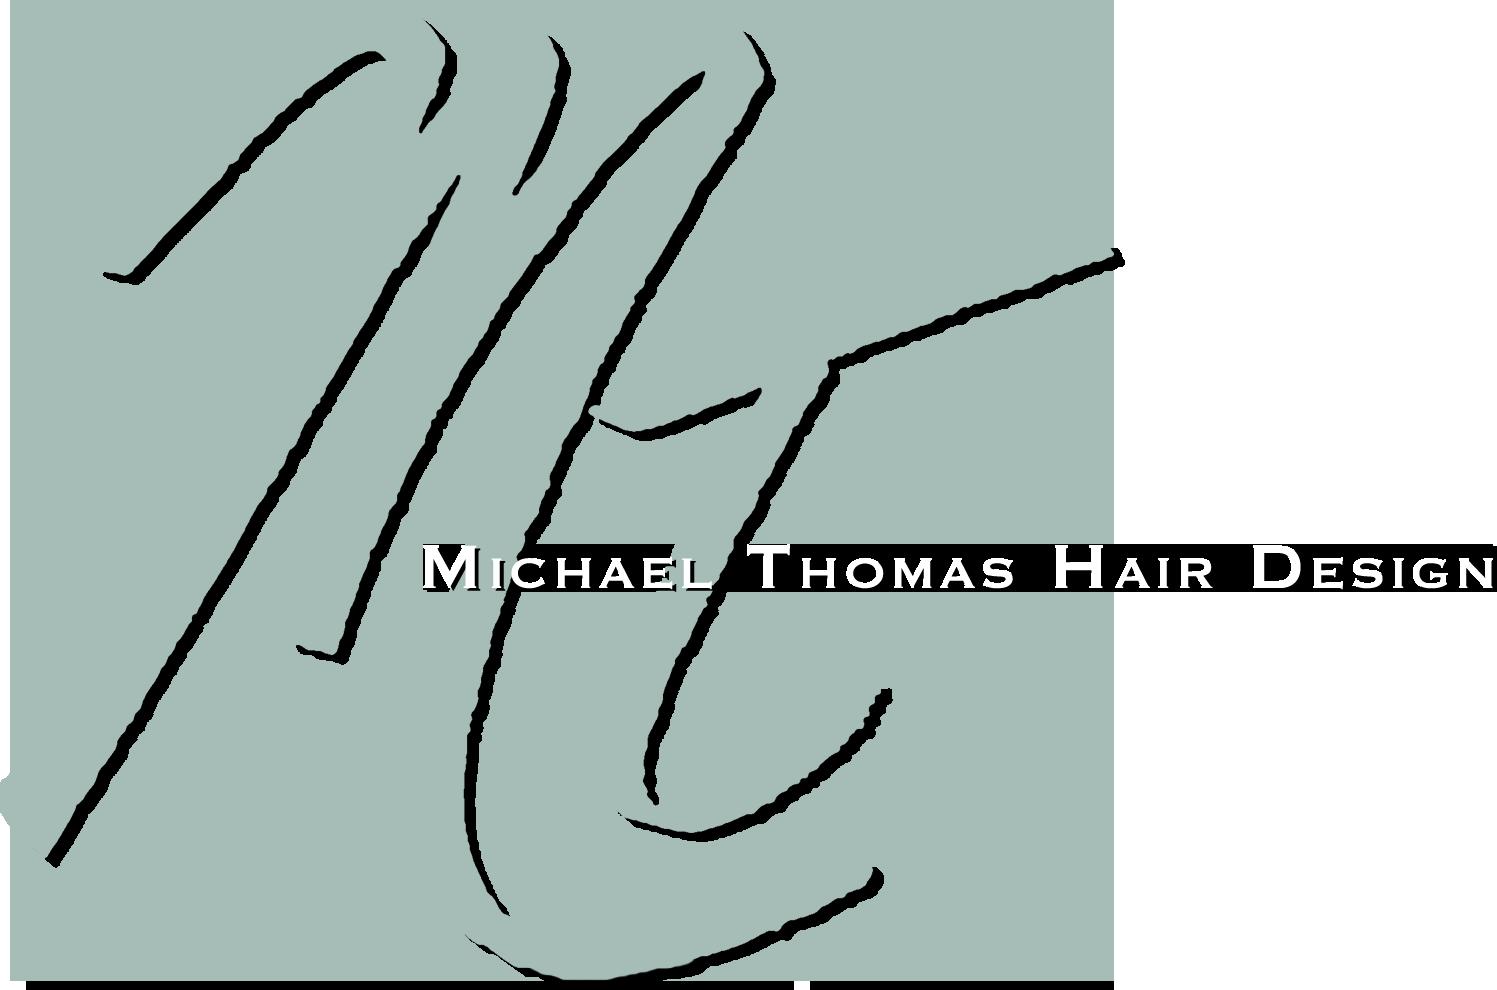 Michael Thomas Hair Design